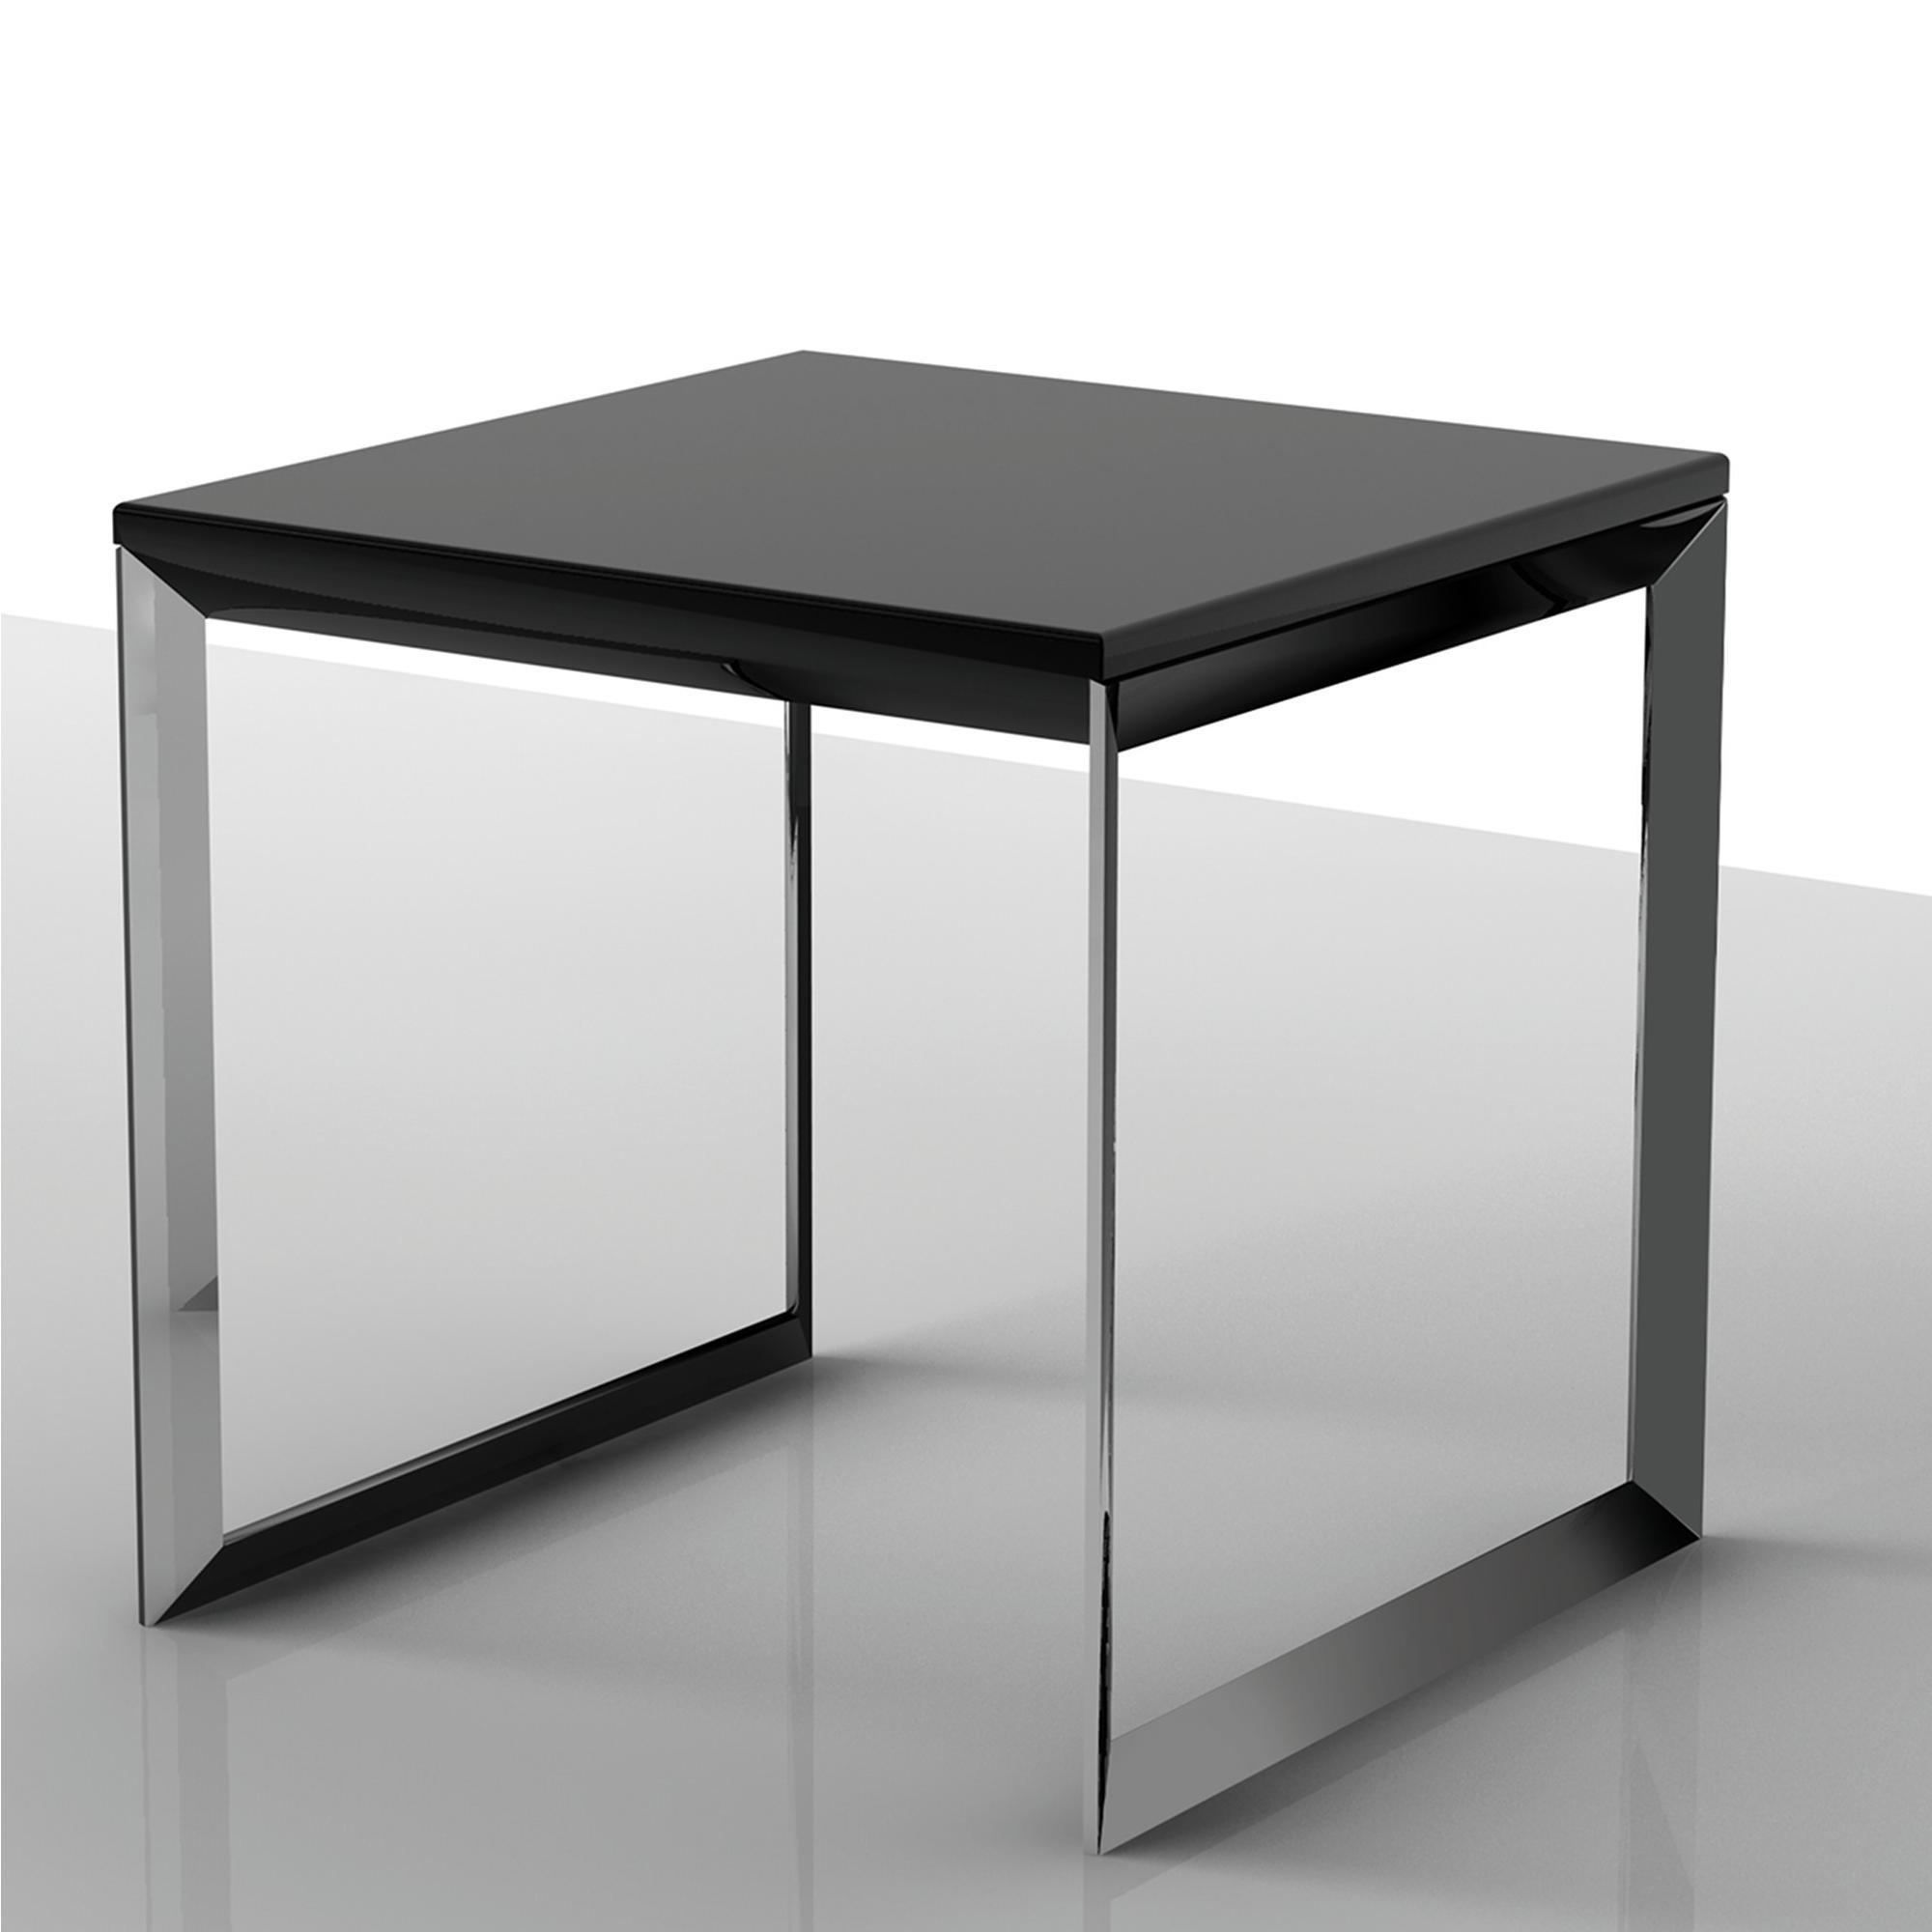 Best Tavolino Basso Da Salotto Images - Modern Design Ideas ...